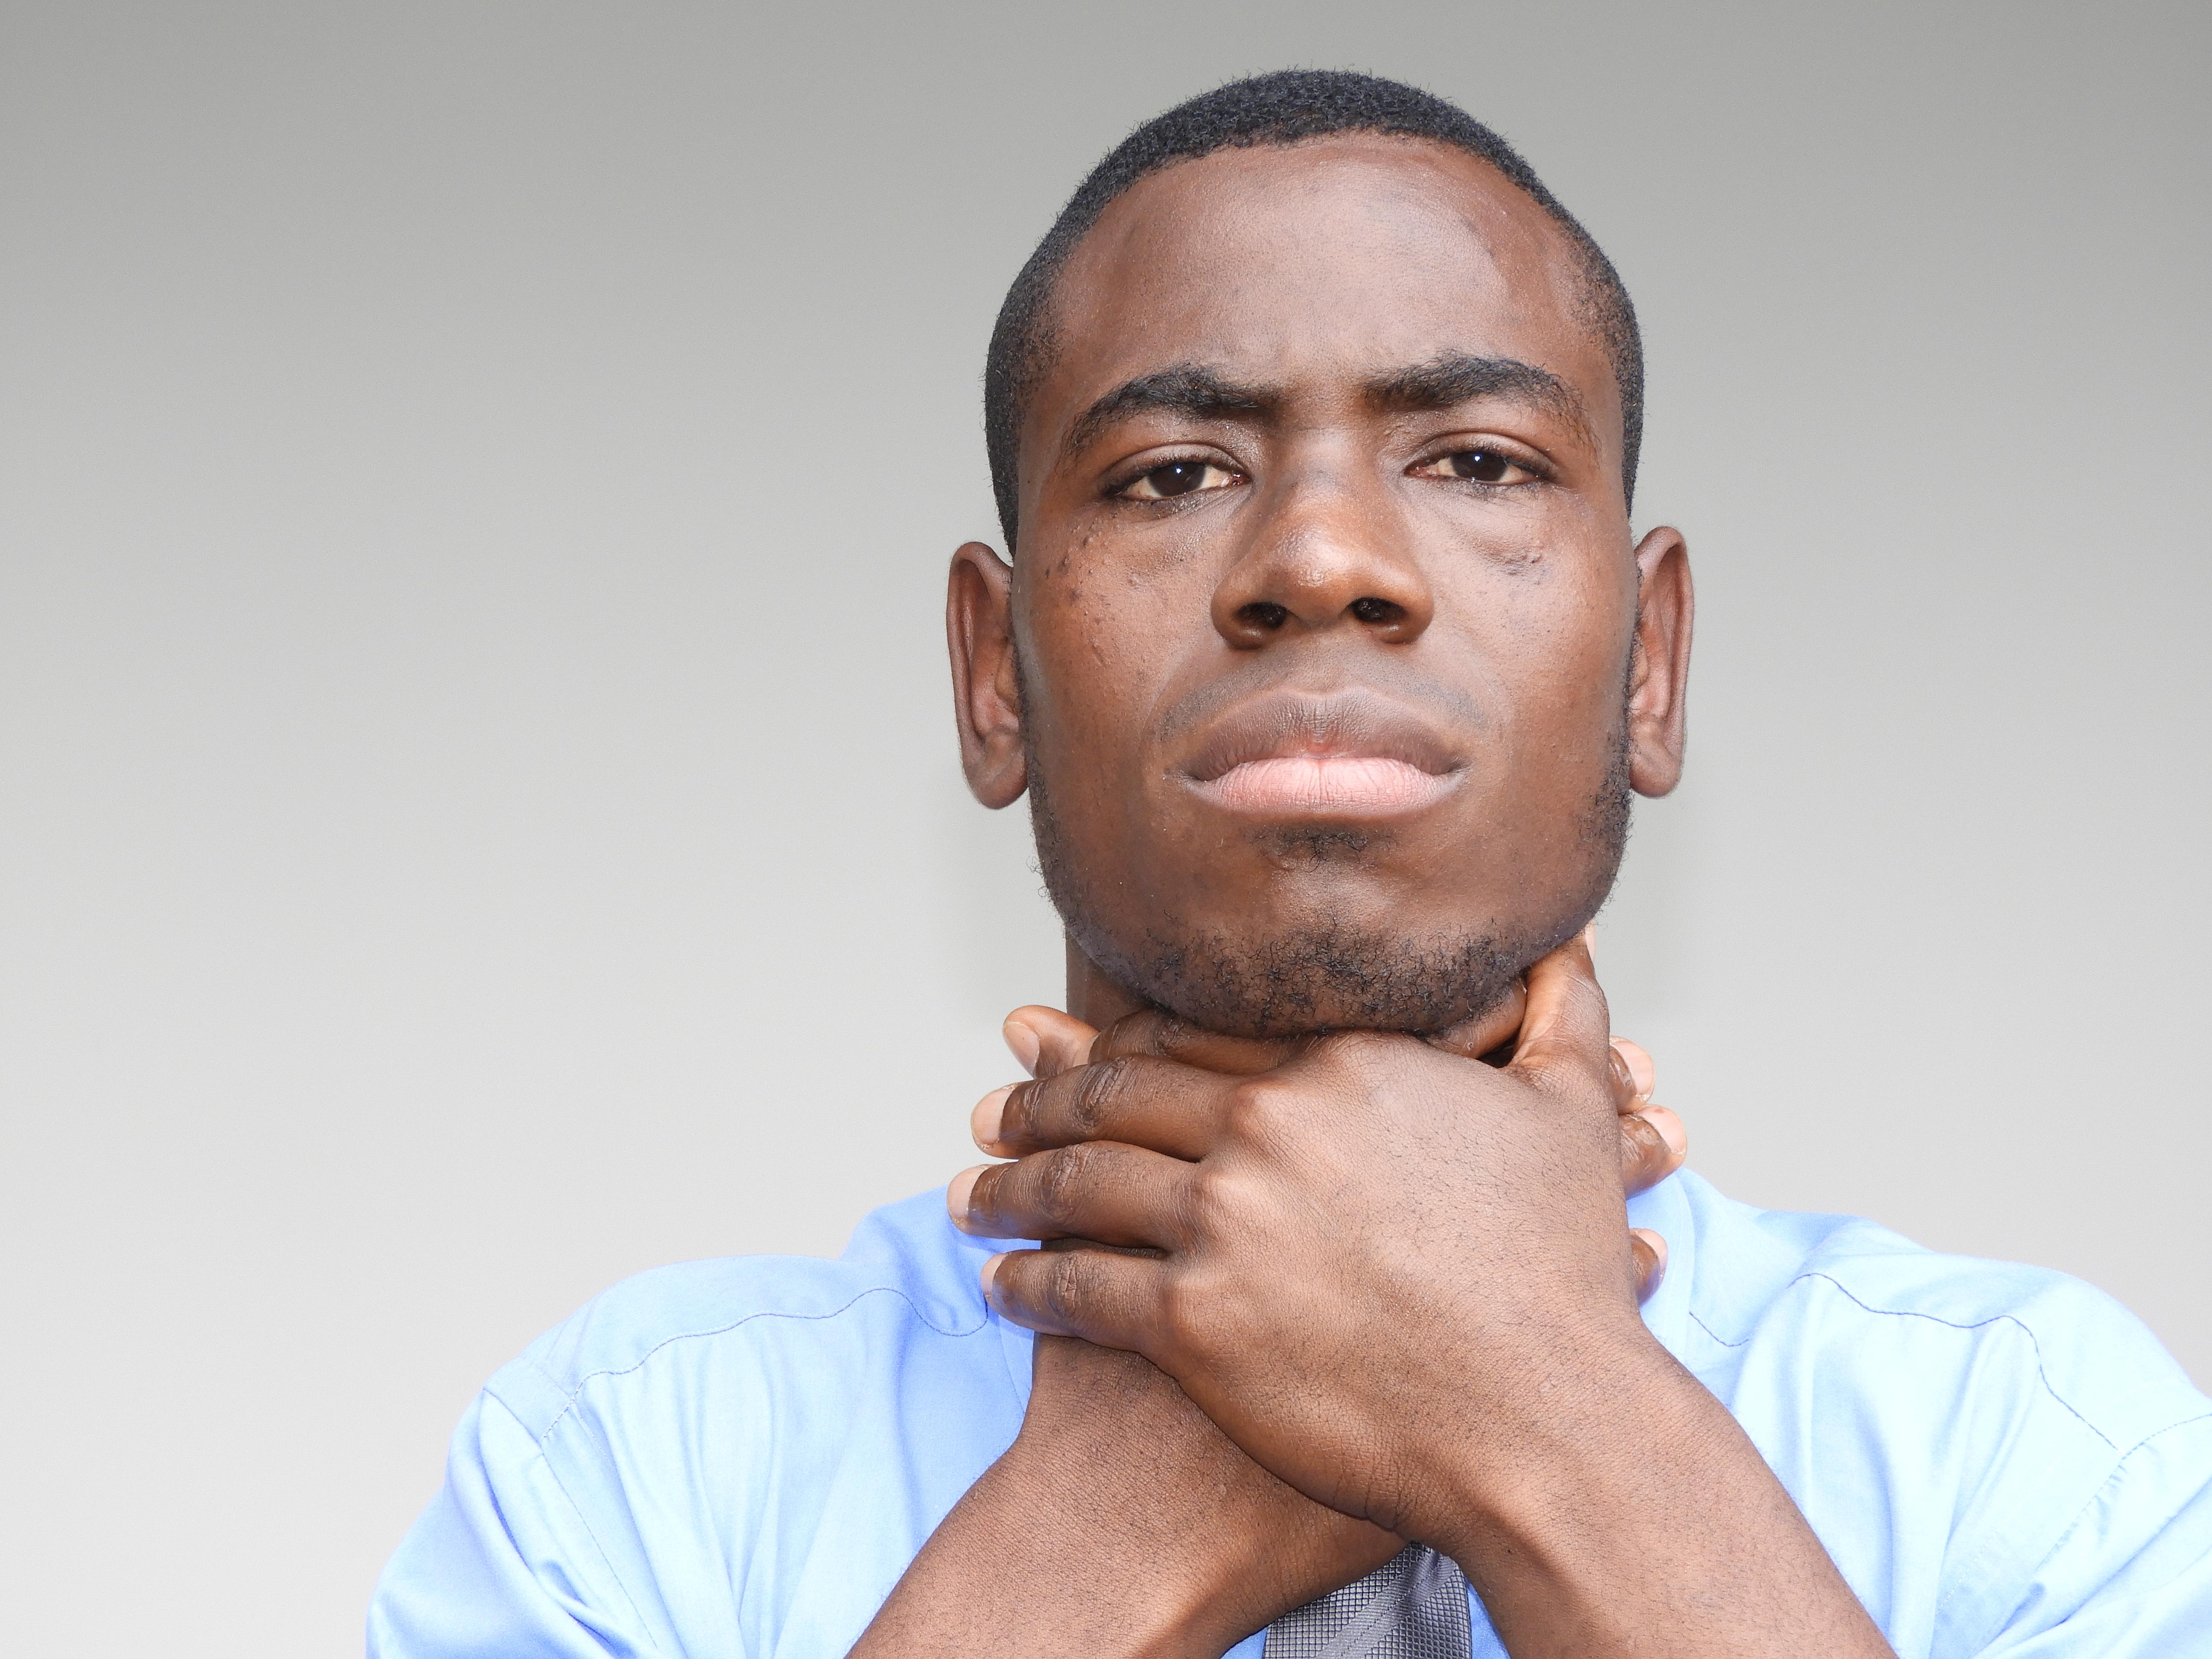 LPR vs. Laryngeal Cancer Throat Symptom Comparison